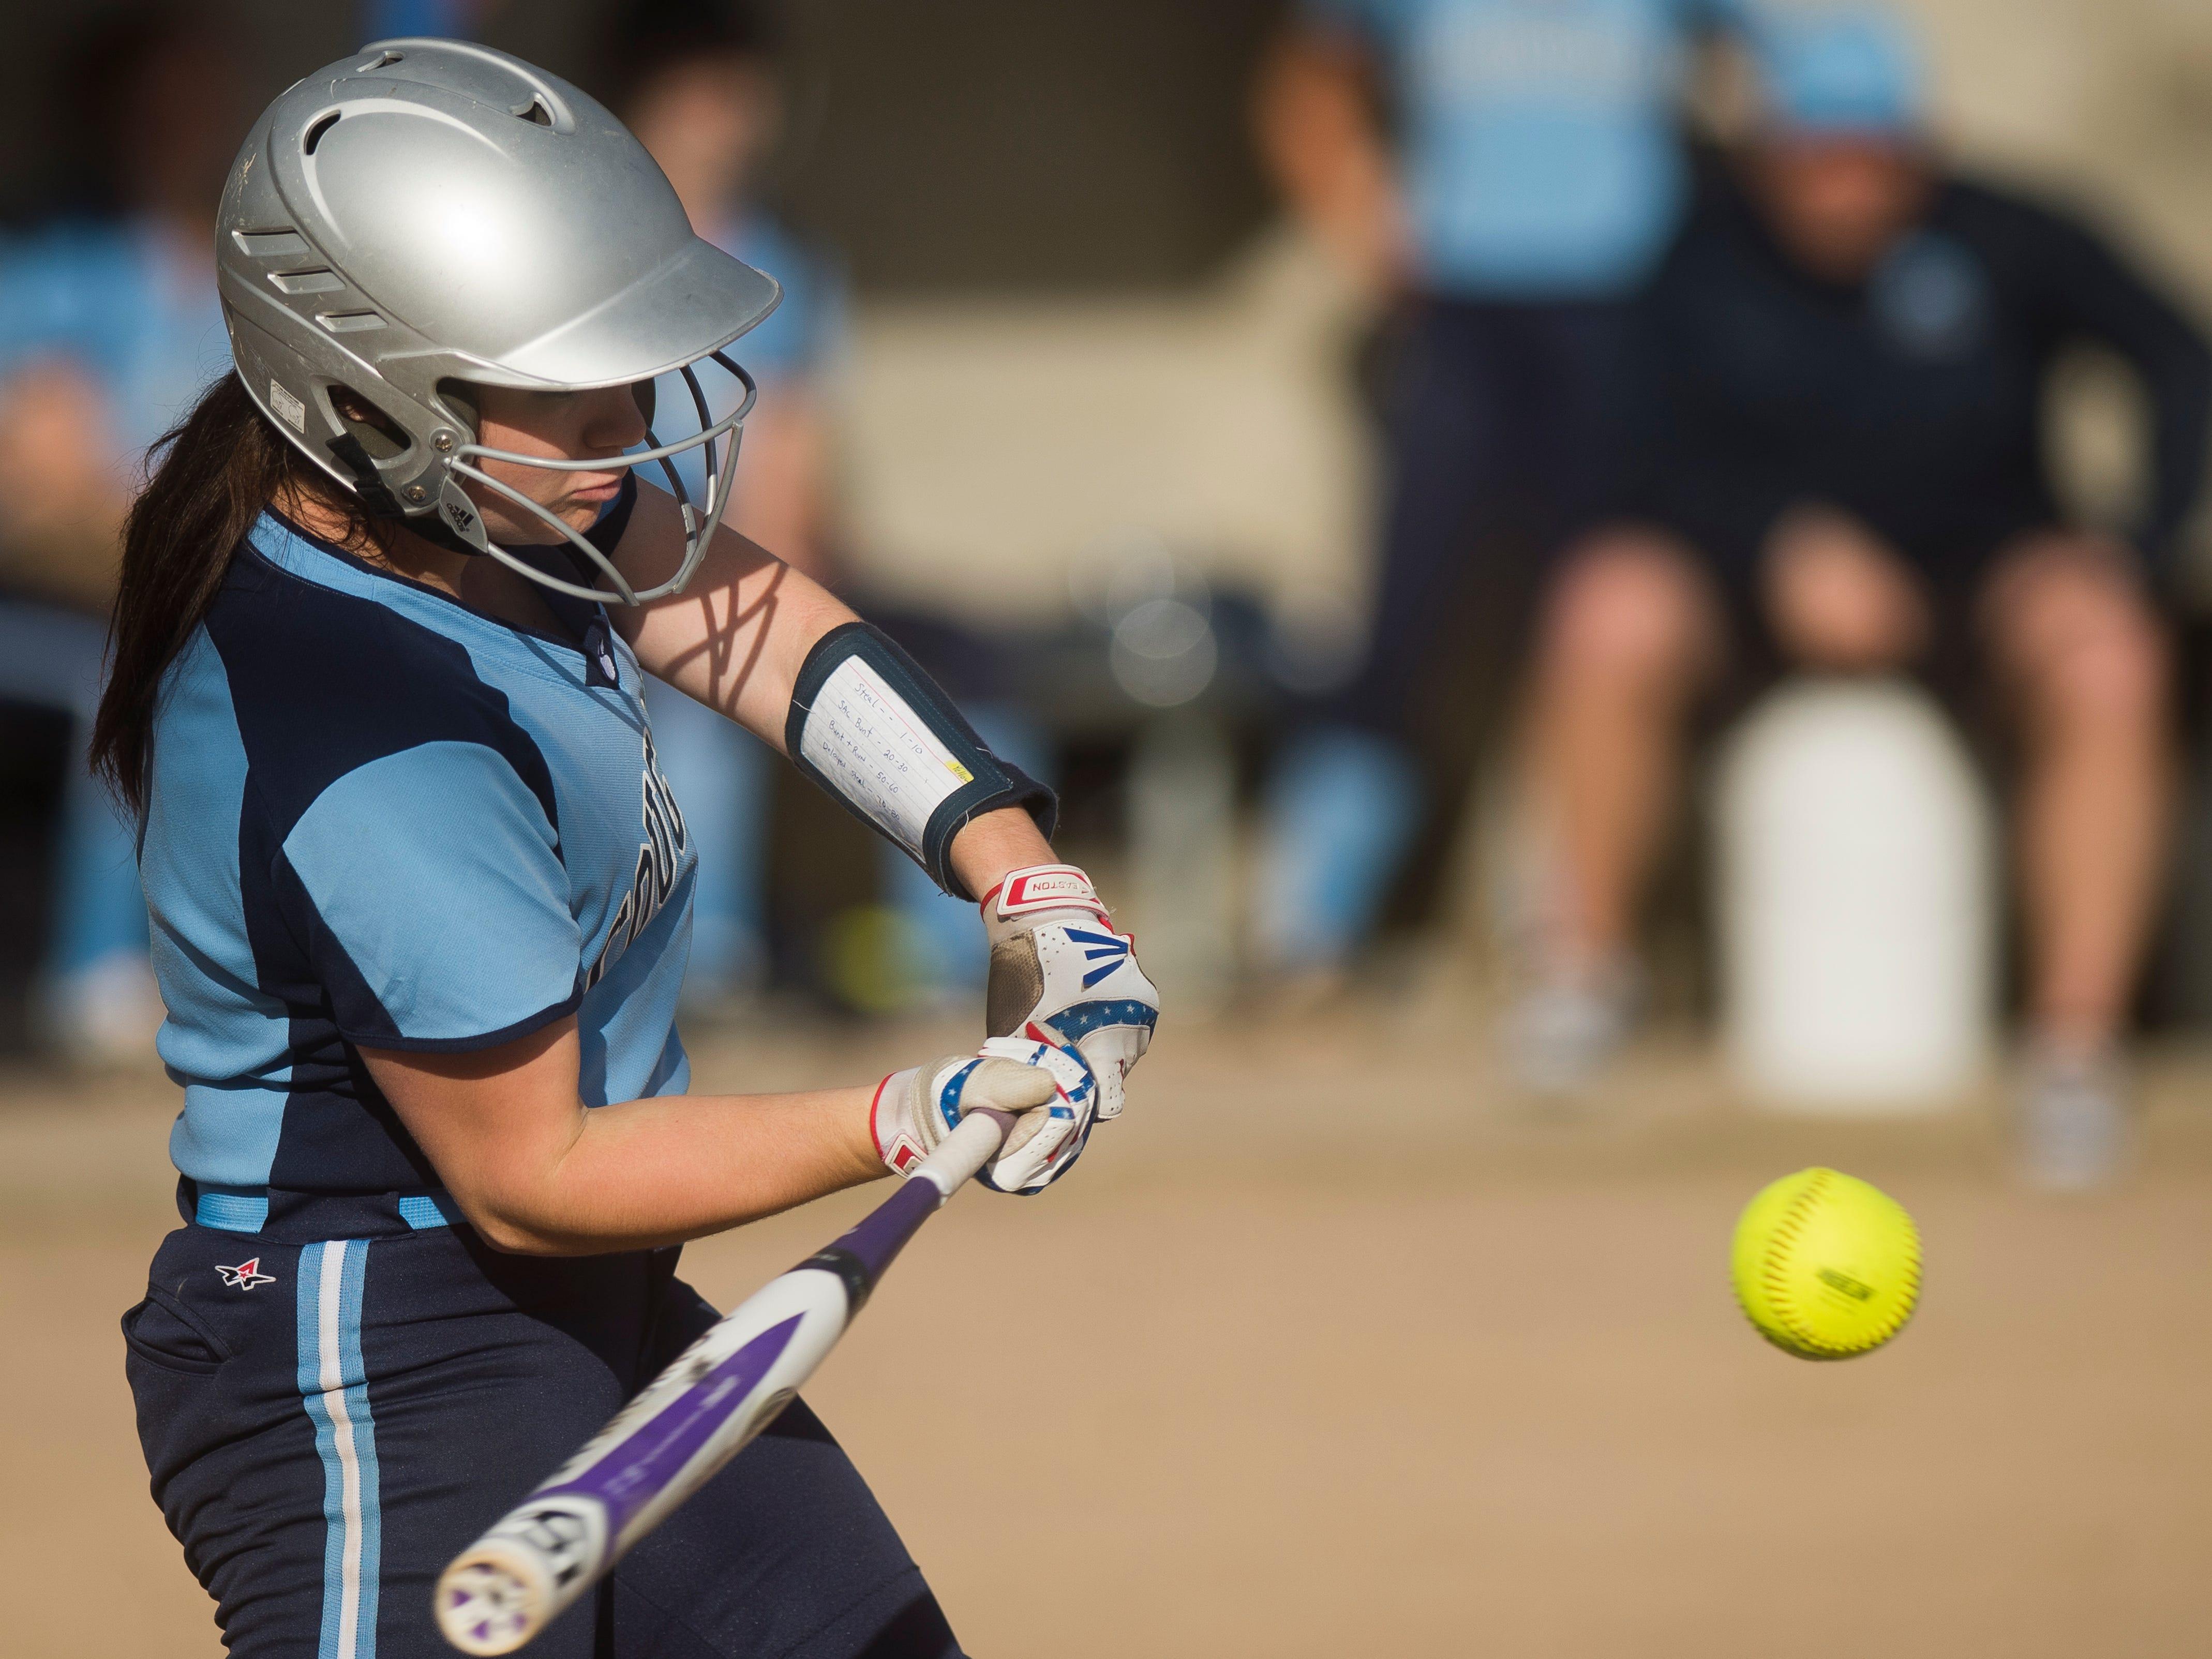 MMU's Sydney LeBourveau smashes a home run during a high school softballl game vs. Middlebury on Tuesday.